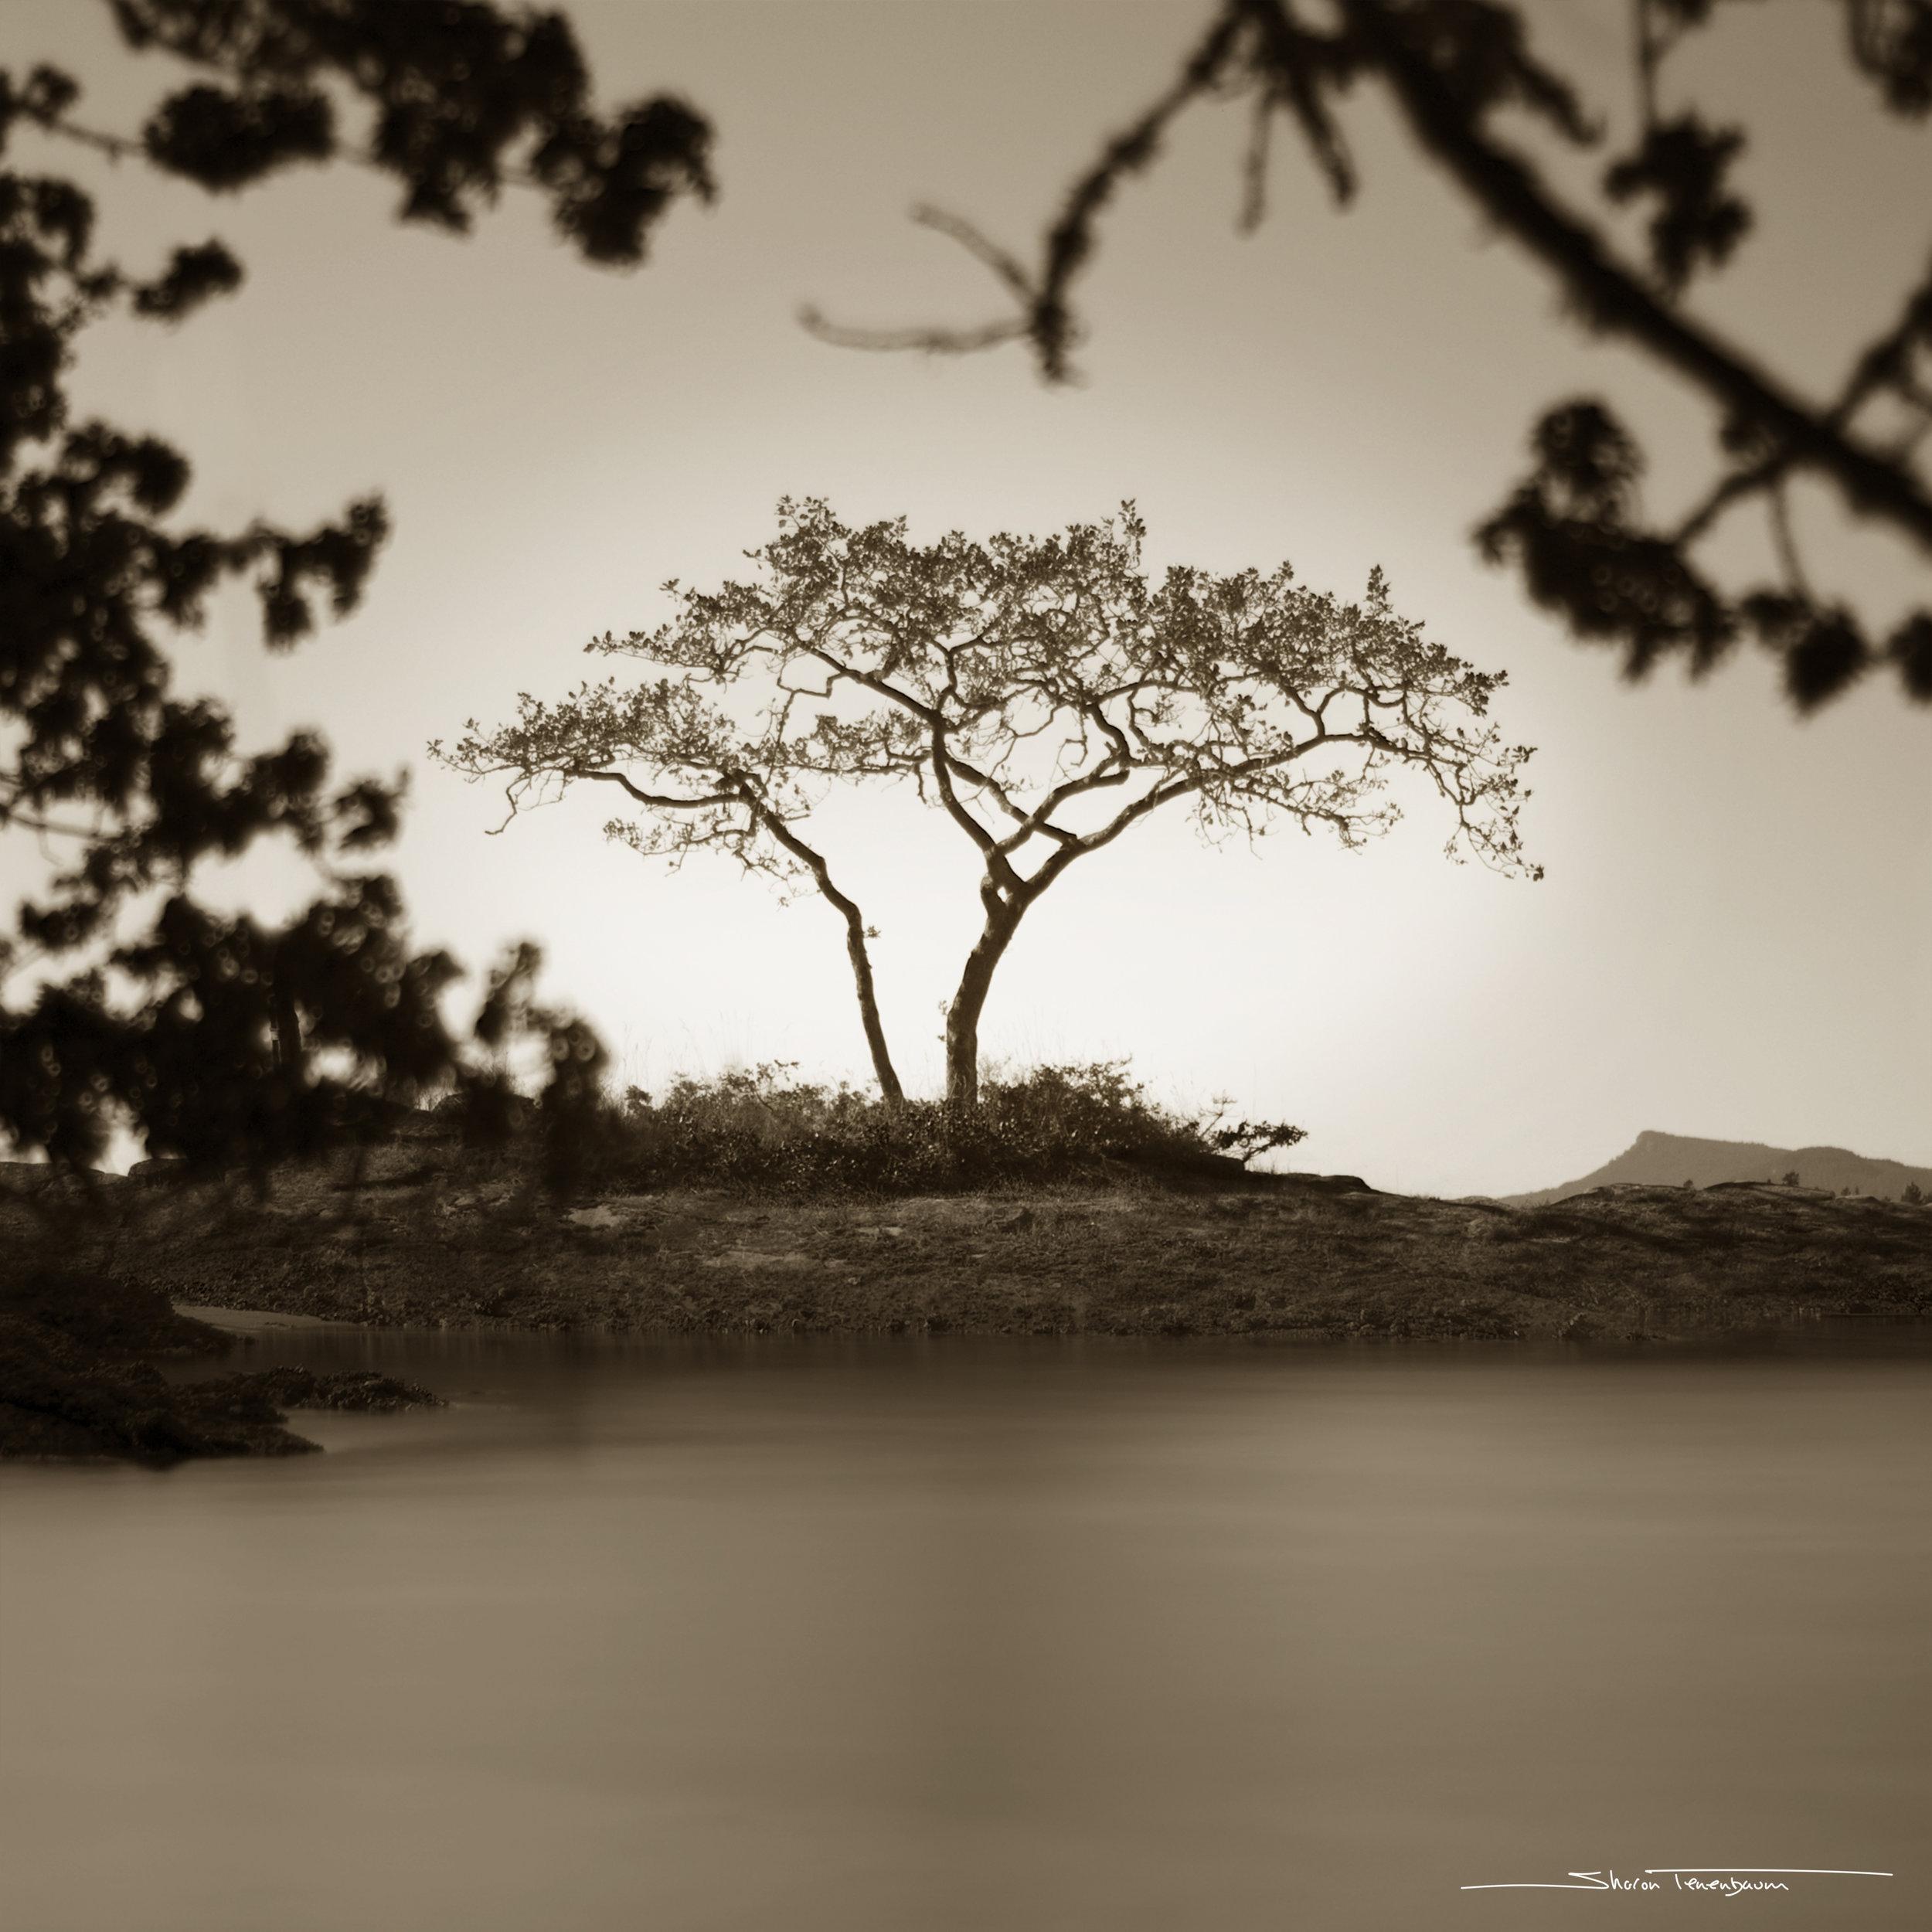 Galiano Tree - Original Image in Sepia Tone